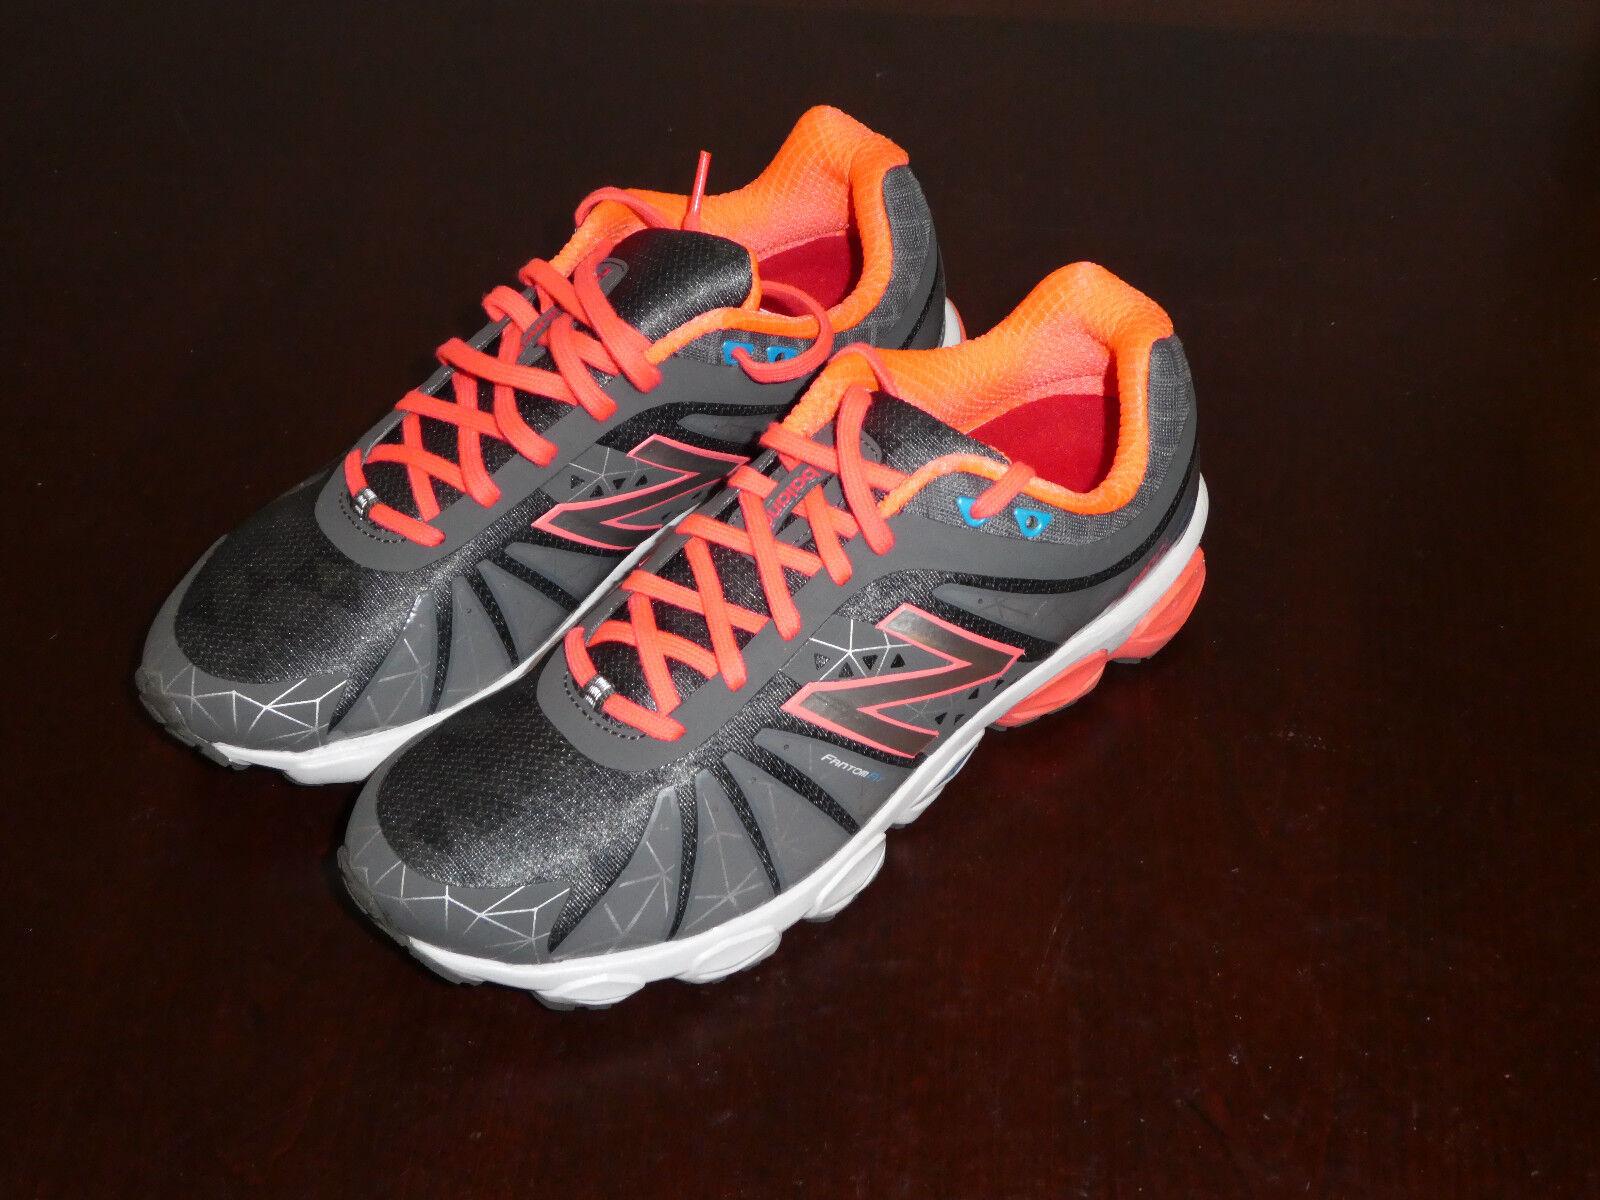 Damenschuhe New Balance 890 Schuhes Schuhes Schuhes Größe 10 W890GA4 Sneakers Jenny Barringer 813be8